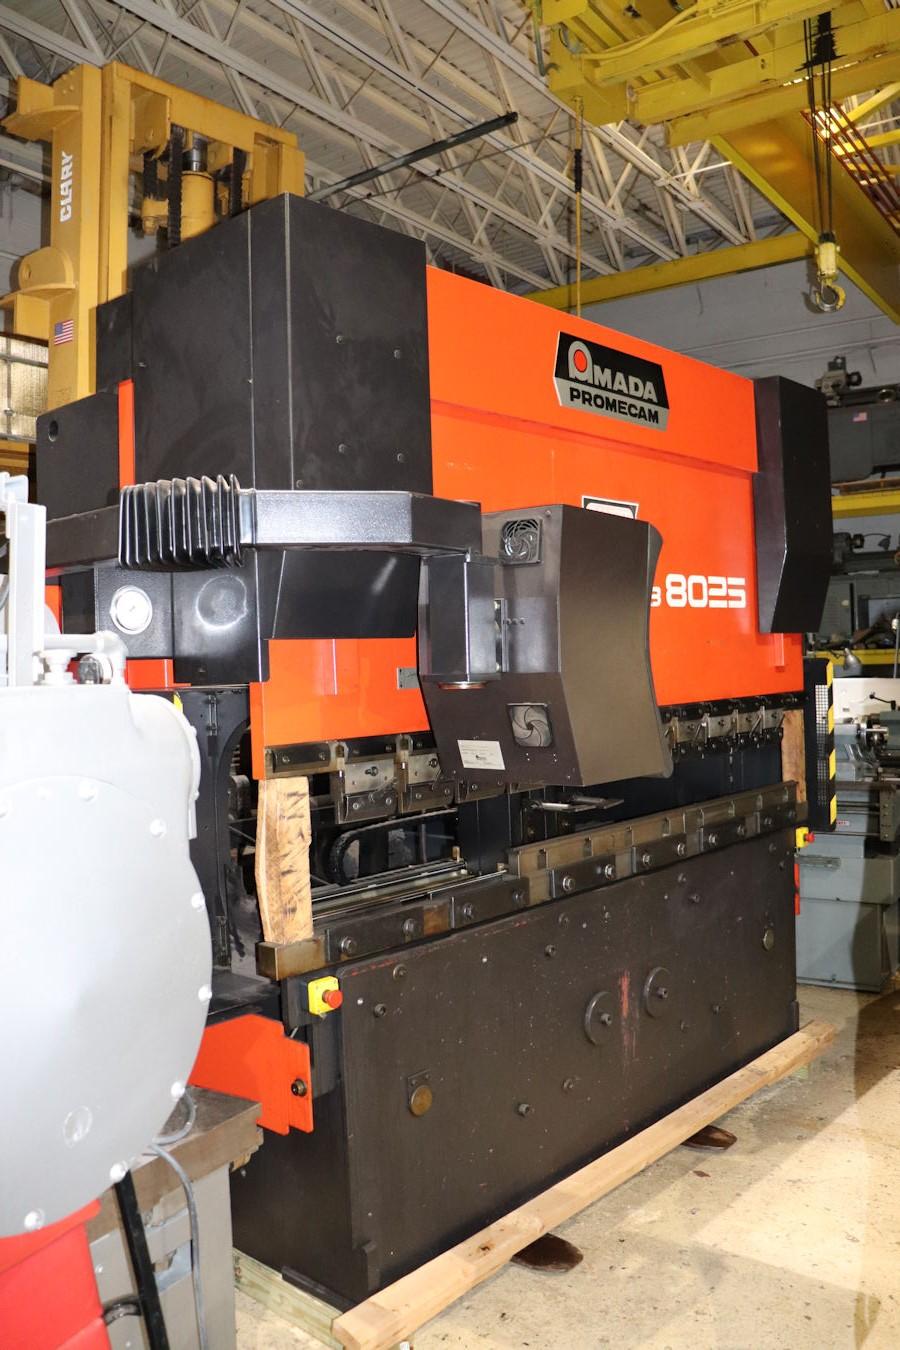 press brakes inter plant sales machinery rh interplantsales com Amada Shear Manual Amada Programing Press Break Manual HG 8025